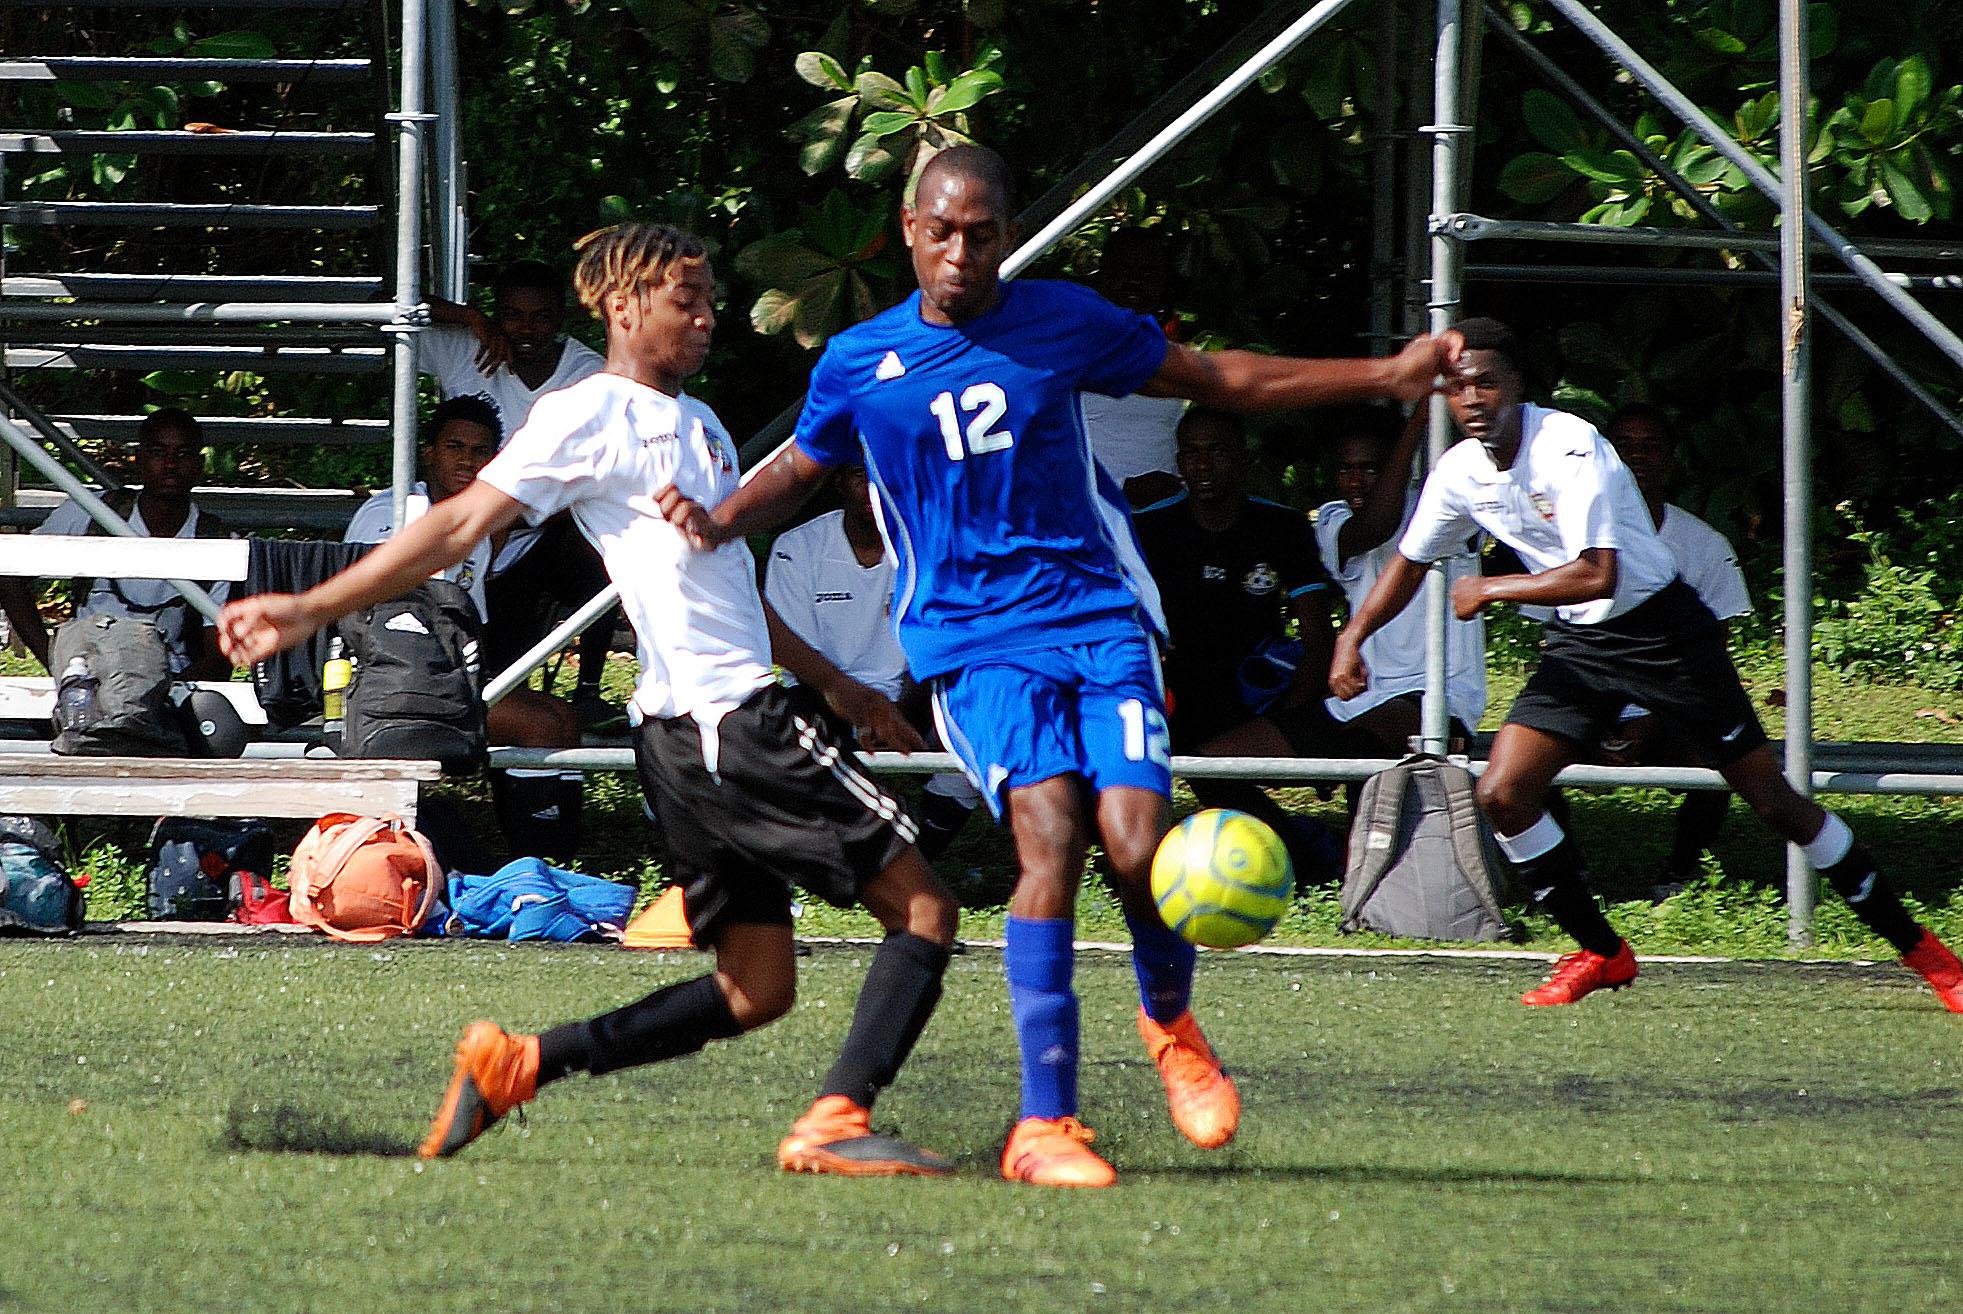 Mingoes soccer side wins preseason scrimmage, prepares to defend BFA title